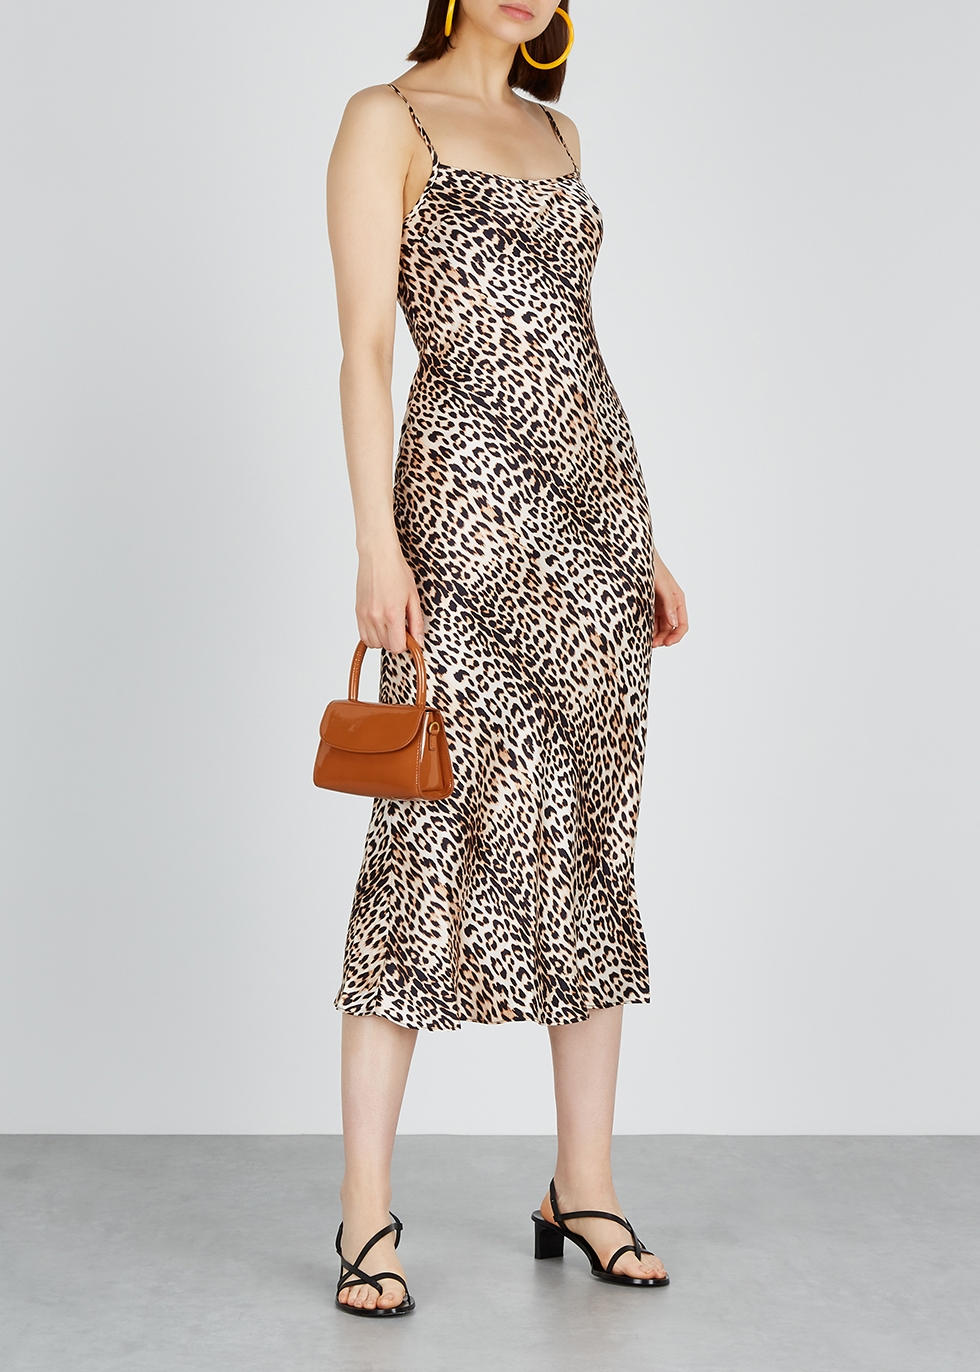 Feline leopard-print silk midi dress - Bec & Bridge